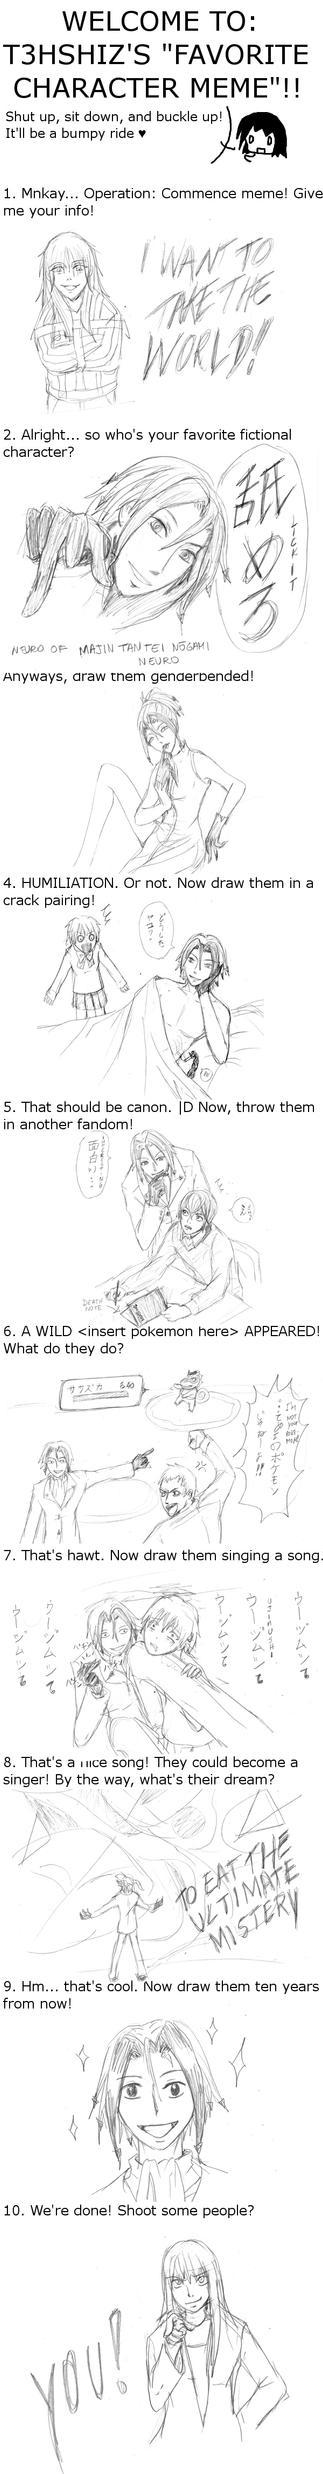 Favorite Character meme: Neuro by Sumomo1001